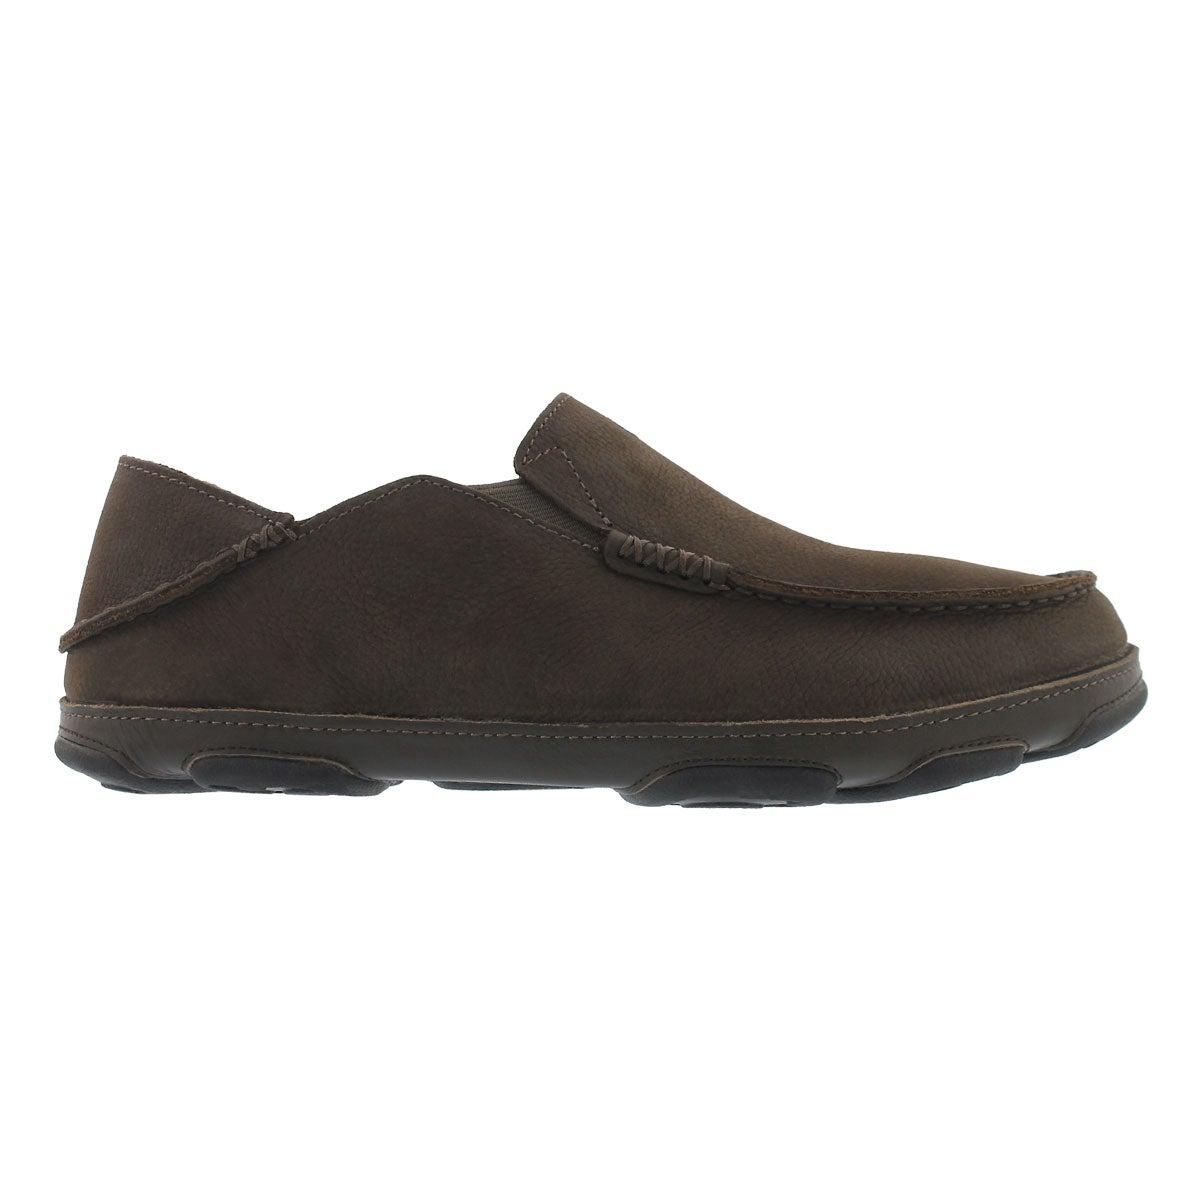 Mns Moloa seal brown slip on casual shoe